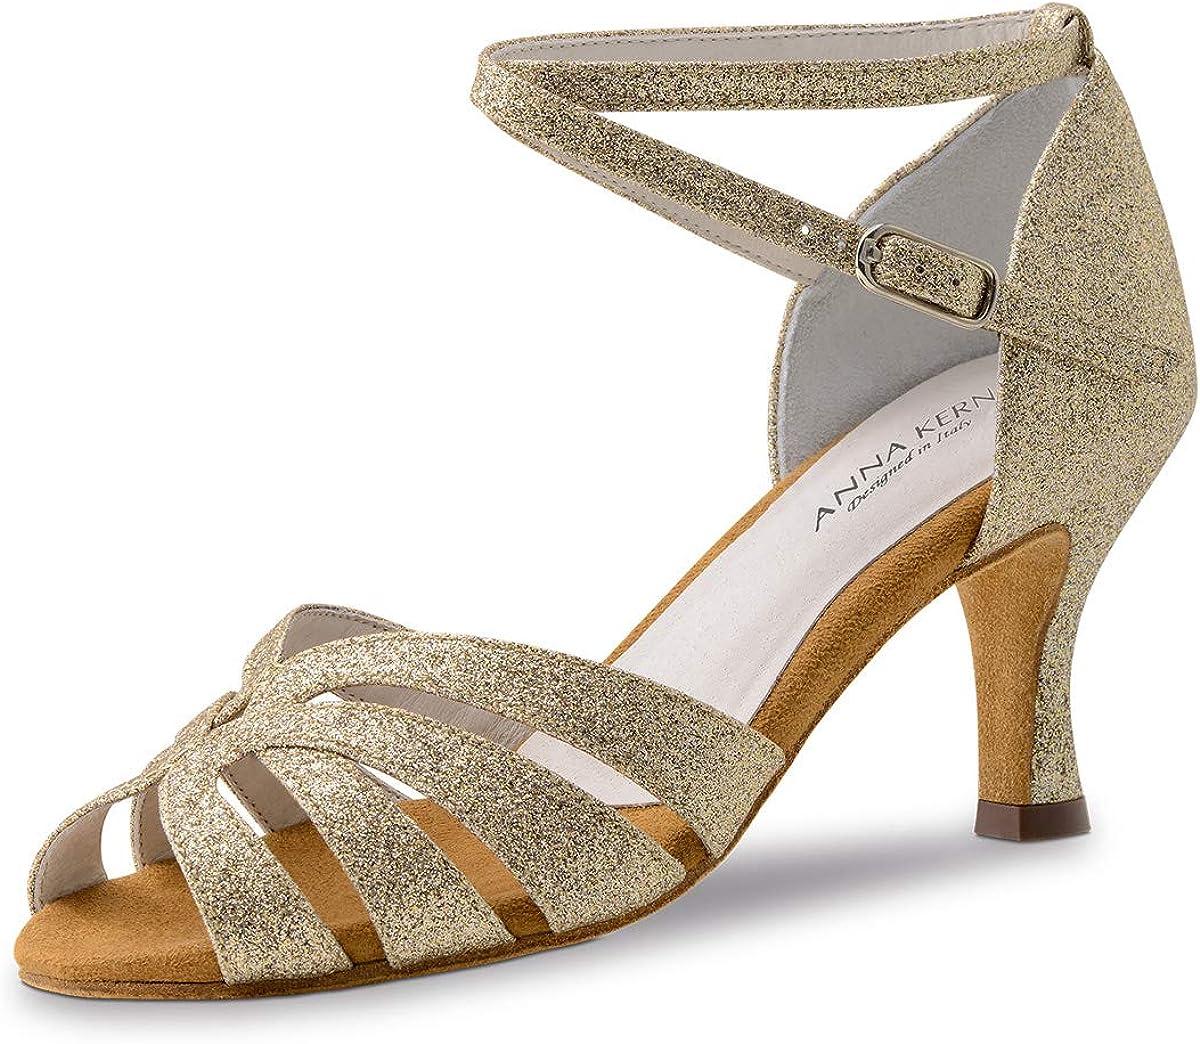 Anna Kern Women´s Dance Shoes 750-60 - Brocade Gold - 6 cm Flare